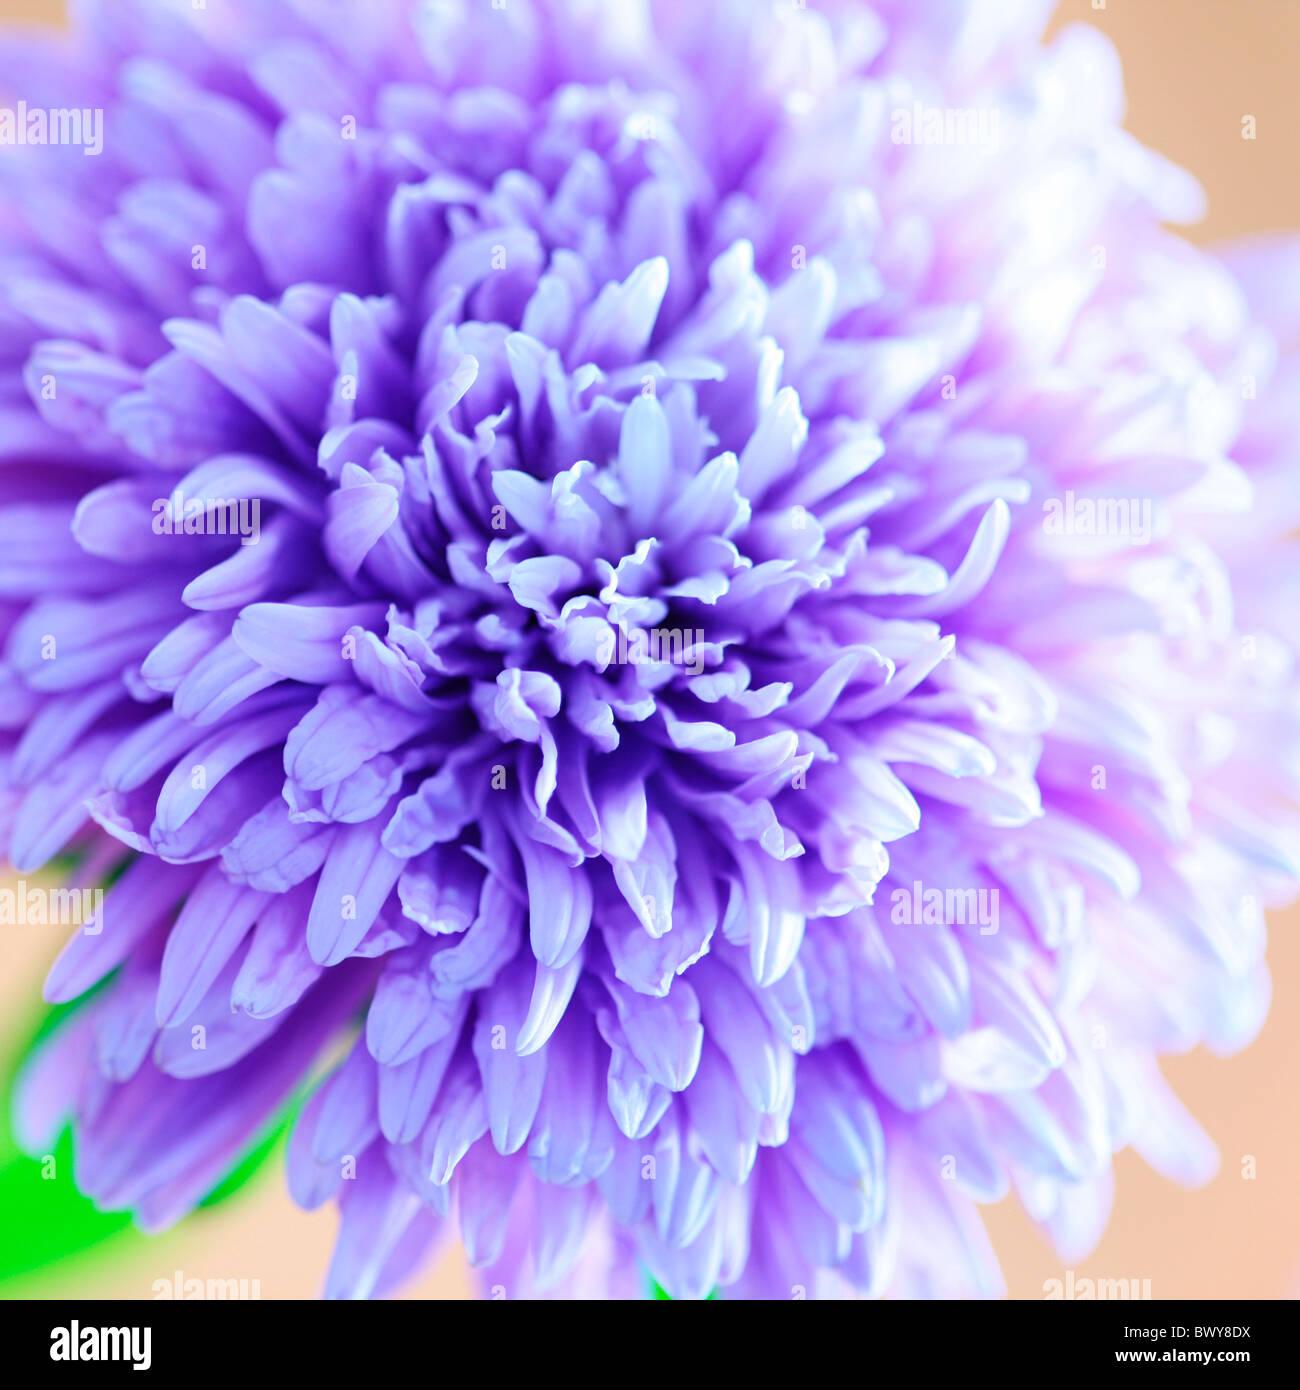 Gorgeous soft focus Blu lilla aster in piena fioritura Jane-Ann Butler JABP Fotografia867 Immagini Stock